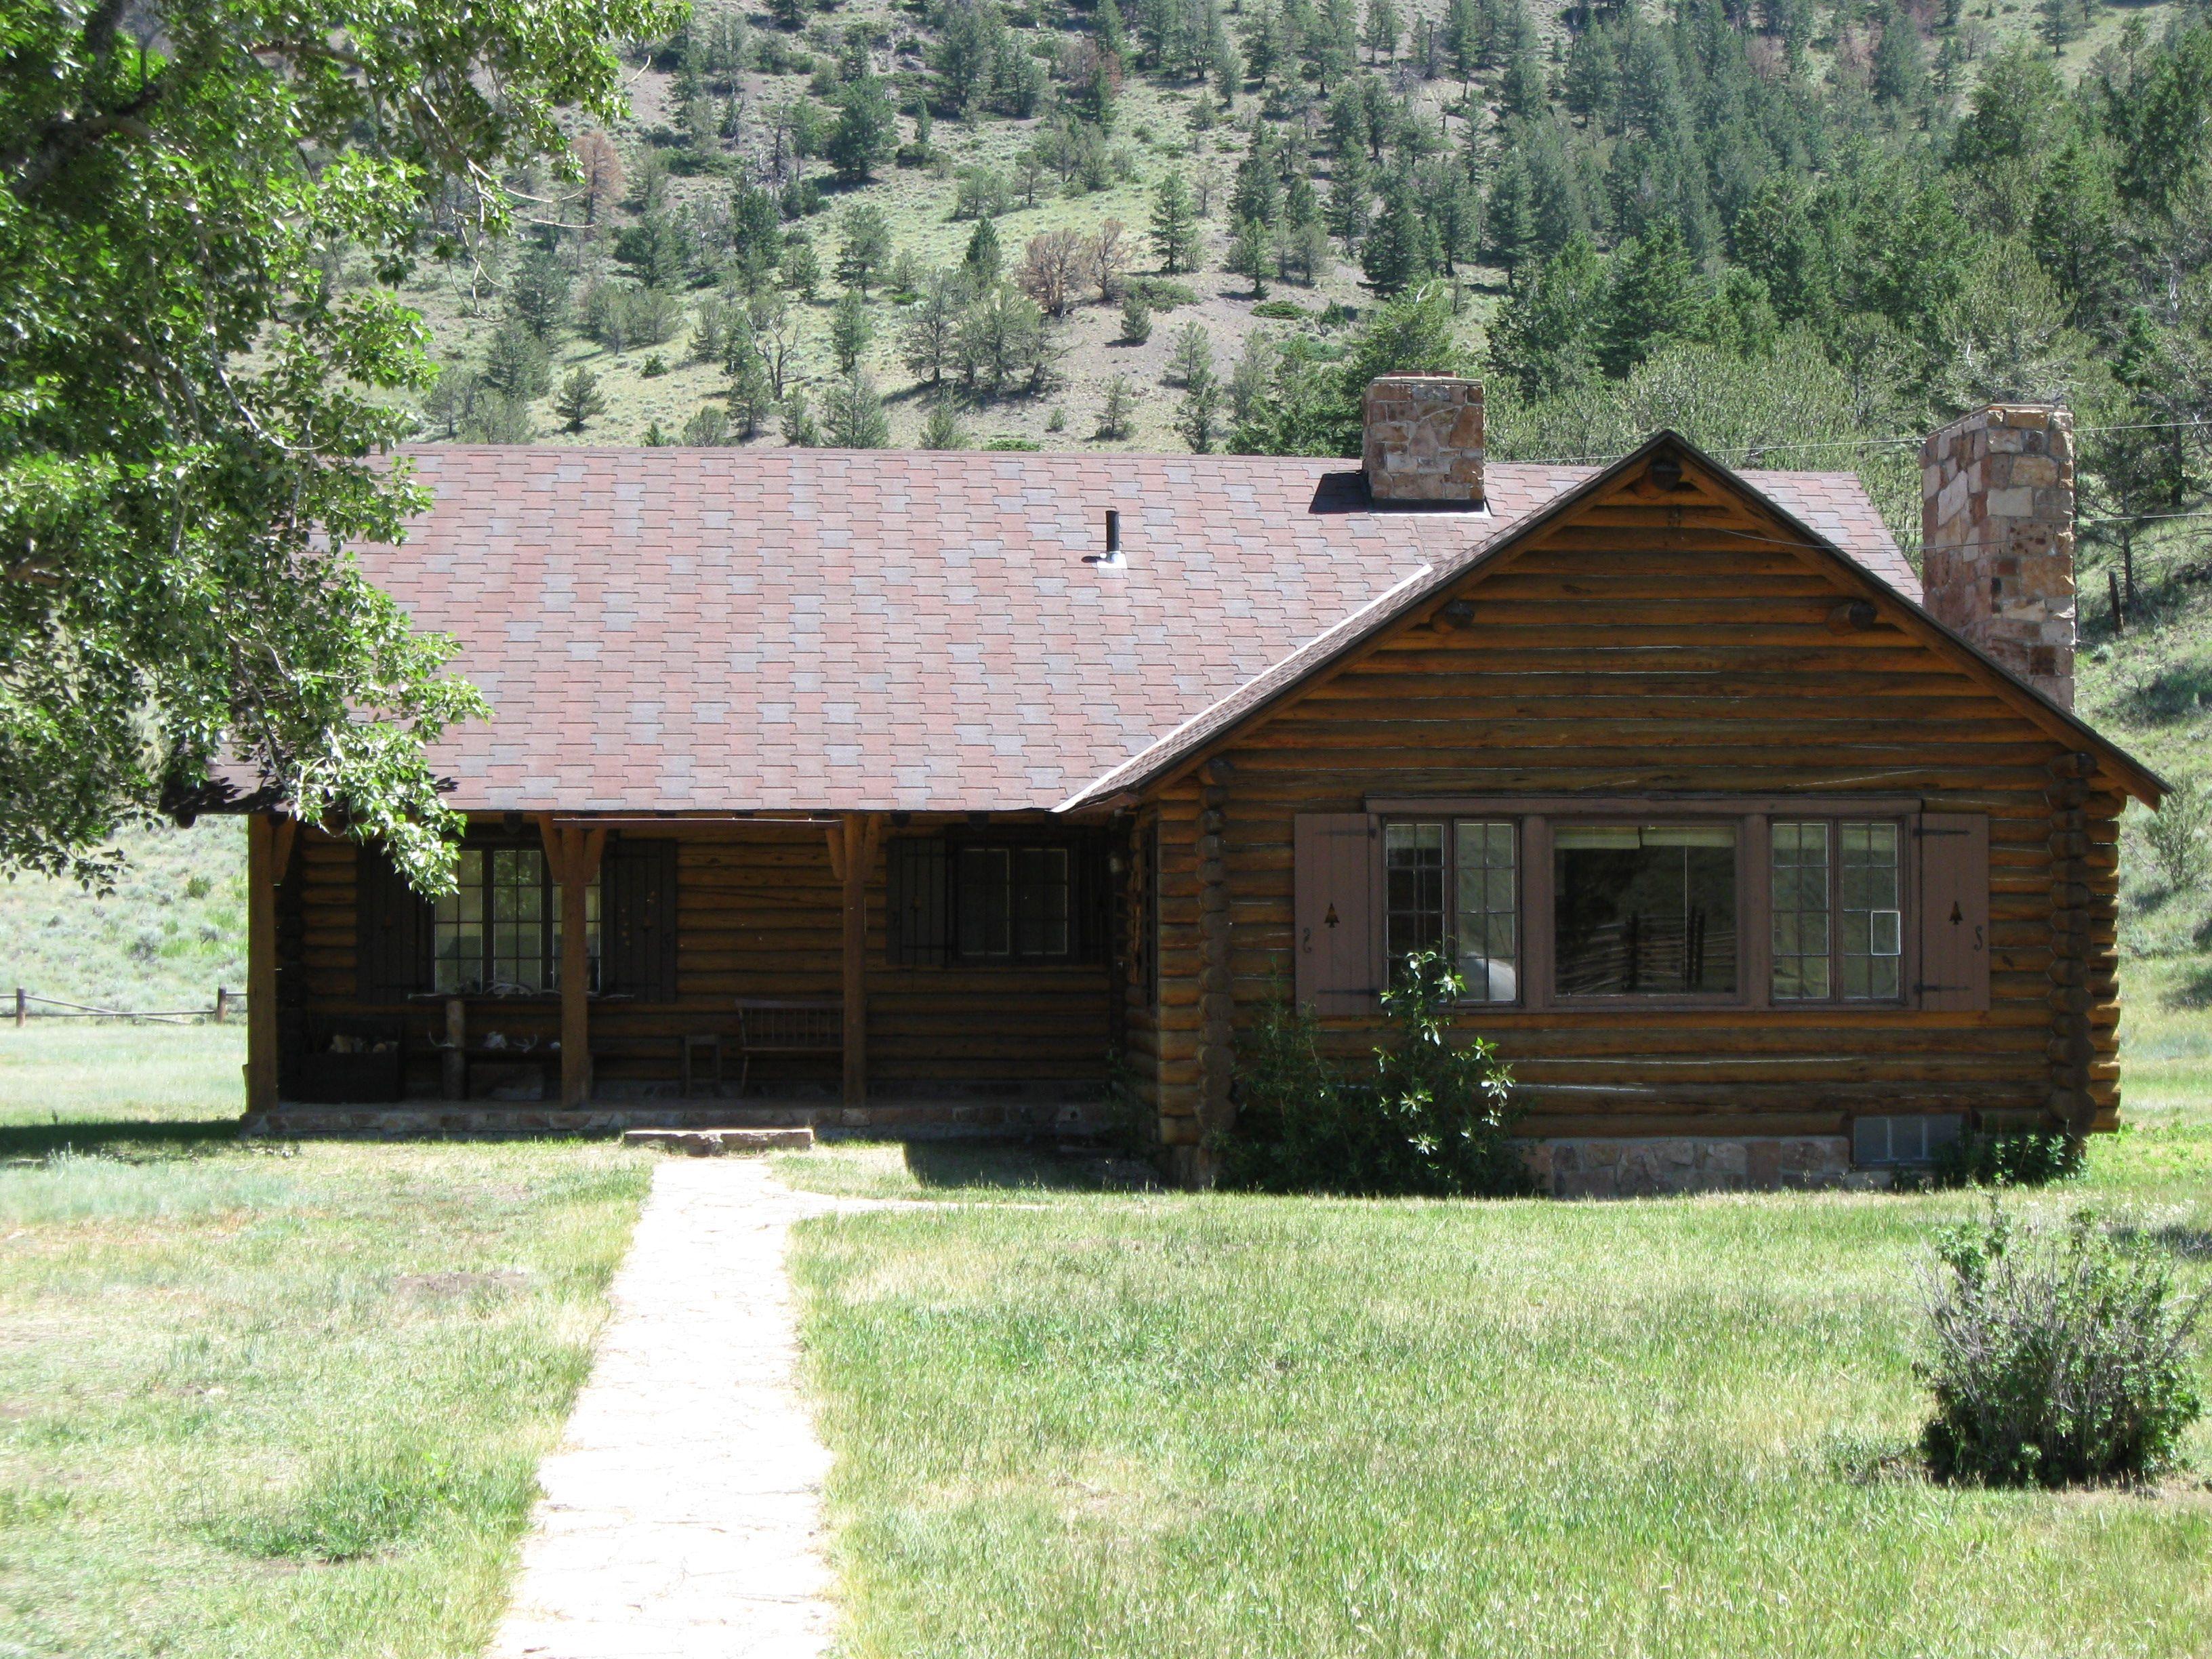 jackson mountain cabin wyoming horses hole teton village blog rendezvous in riding horseback rentals cabins min